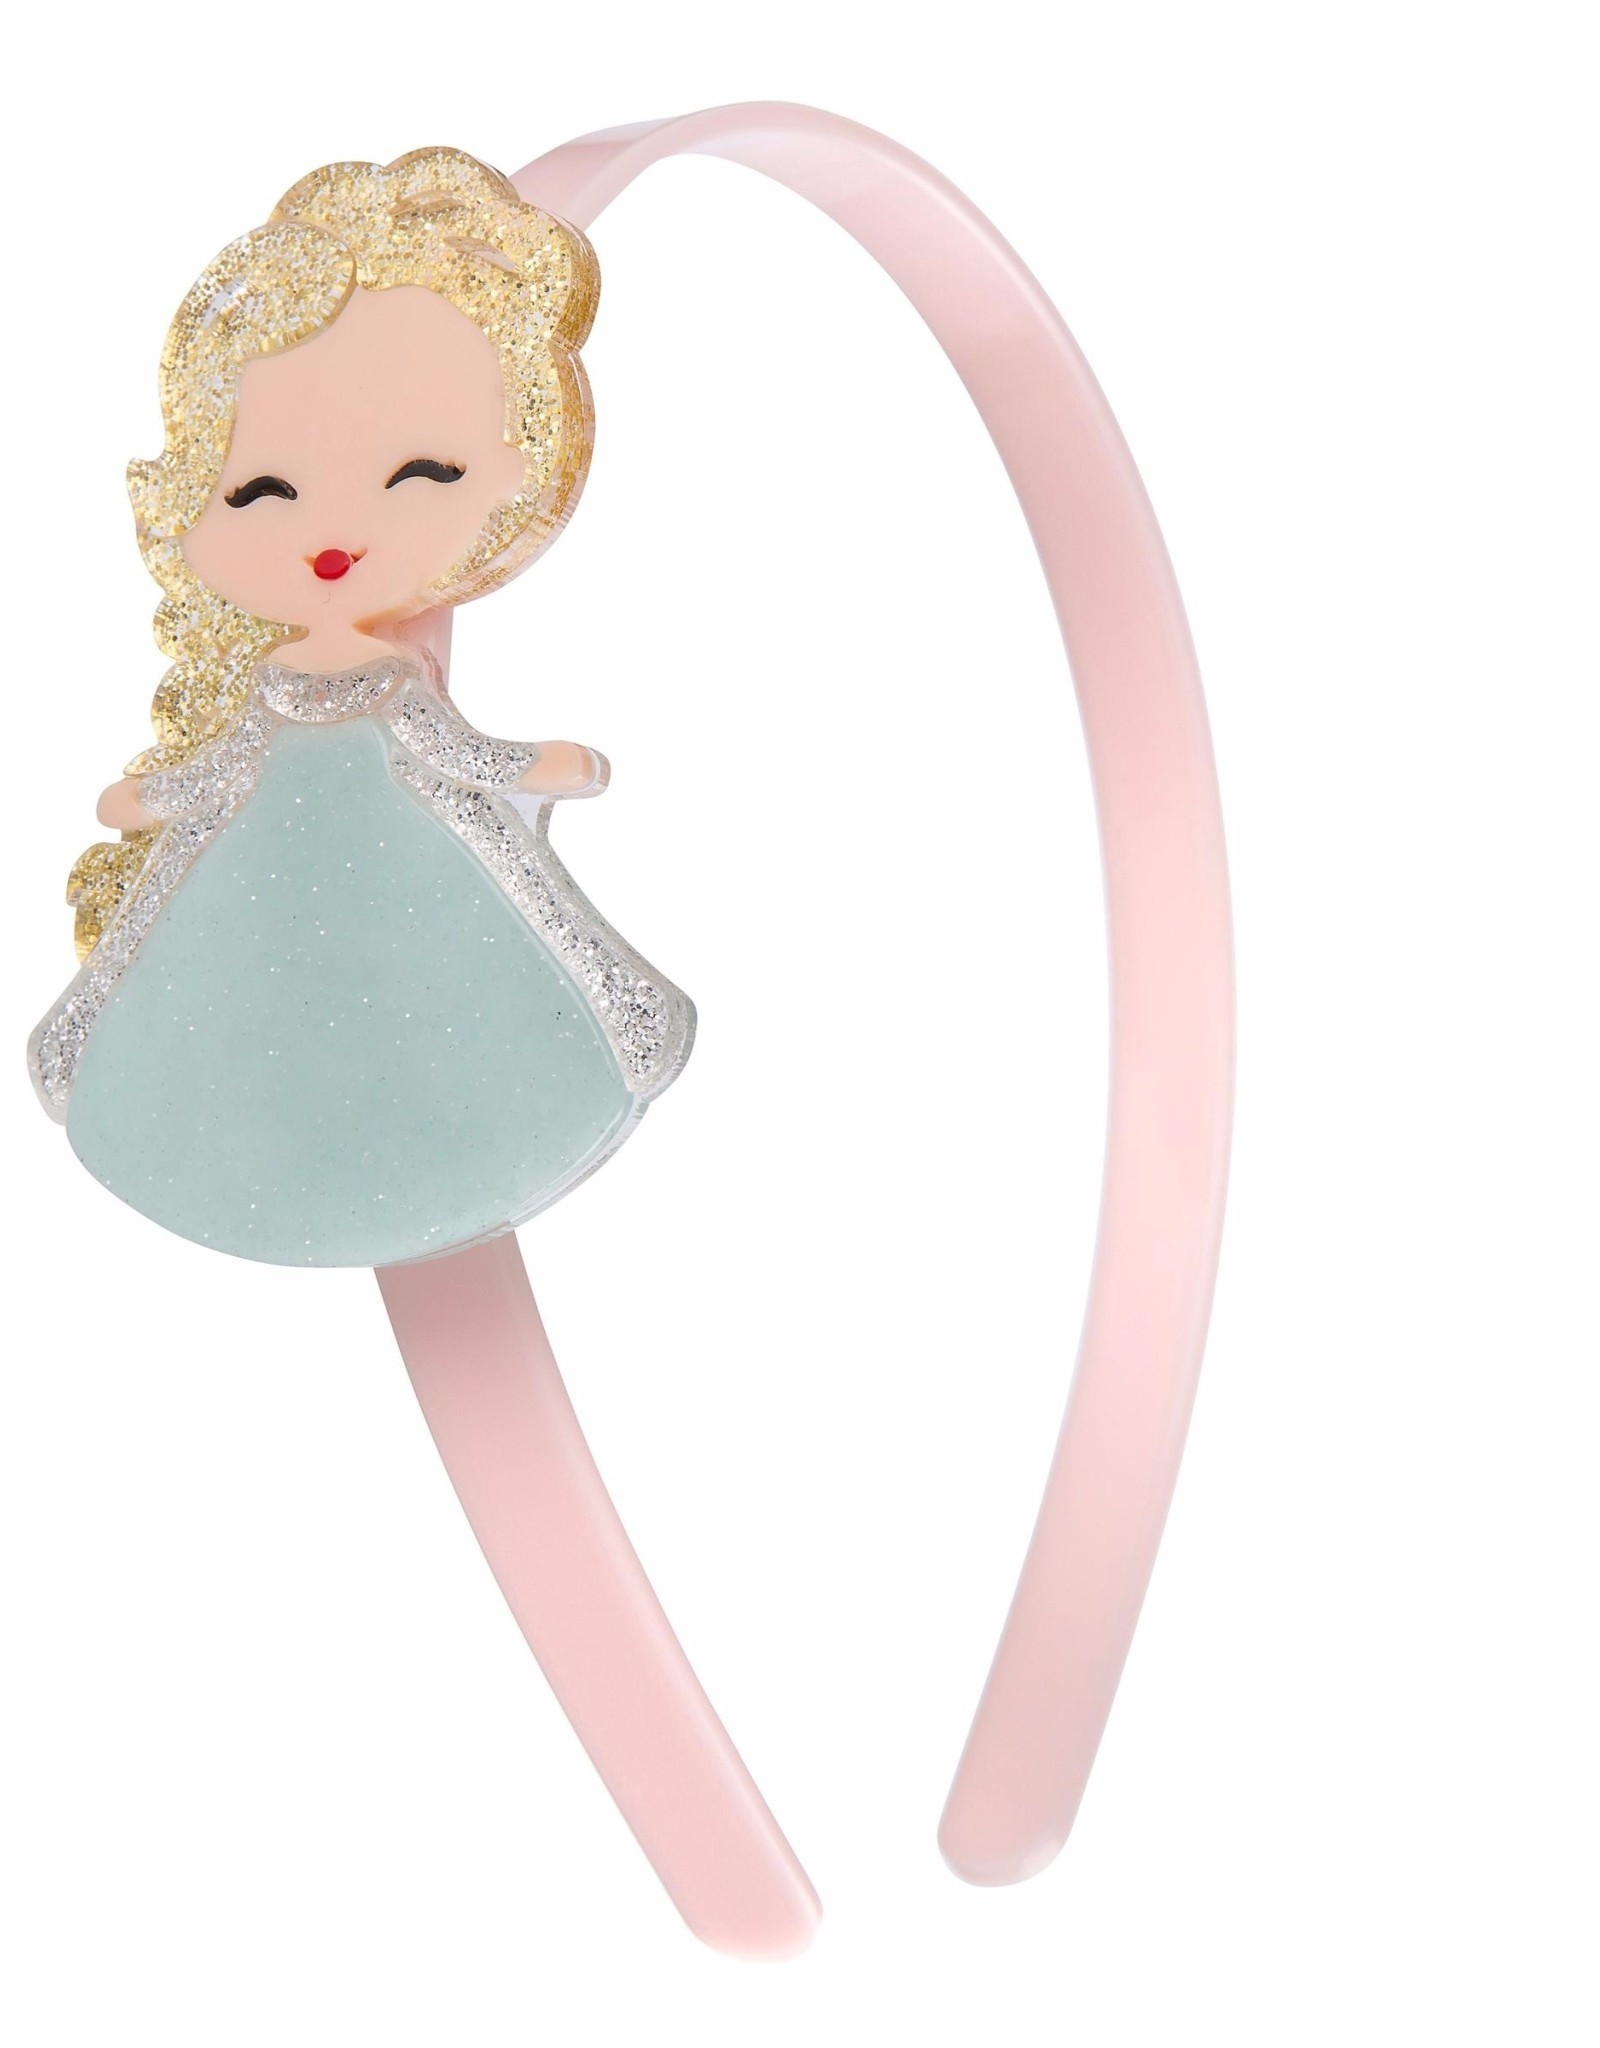 Lillies & Roses Headband Cute Doll with Sparkle Hair (mint dress)